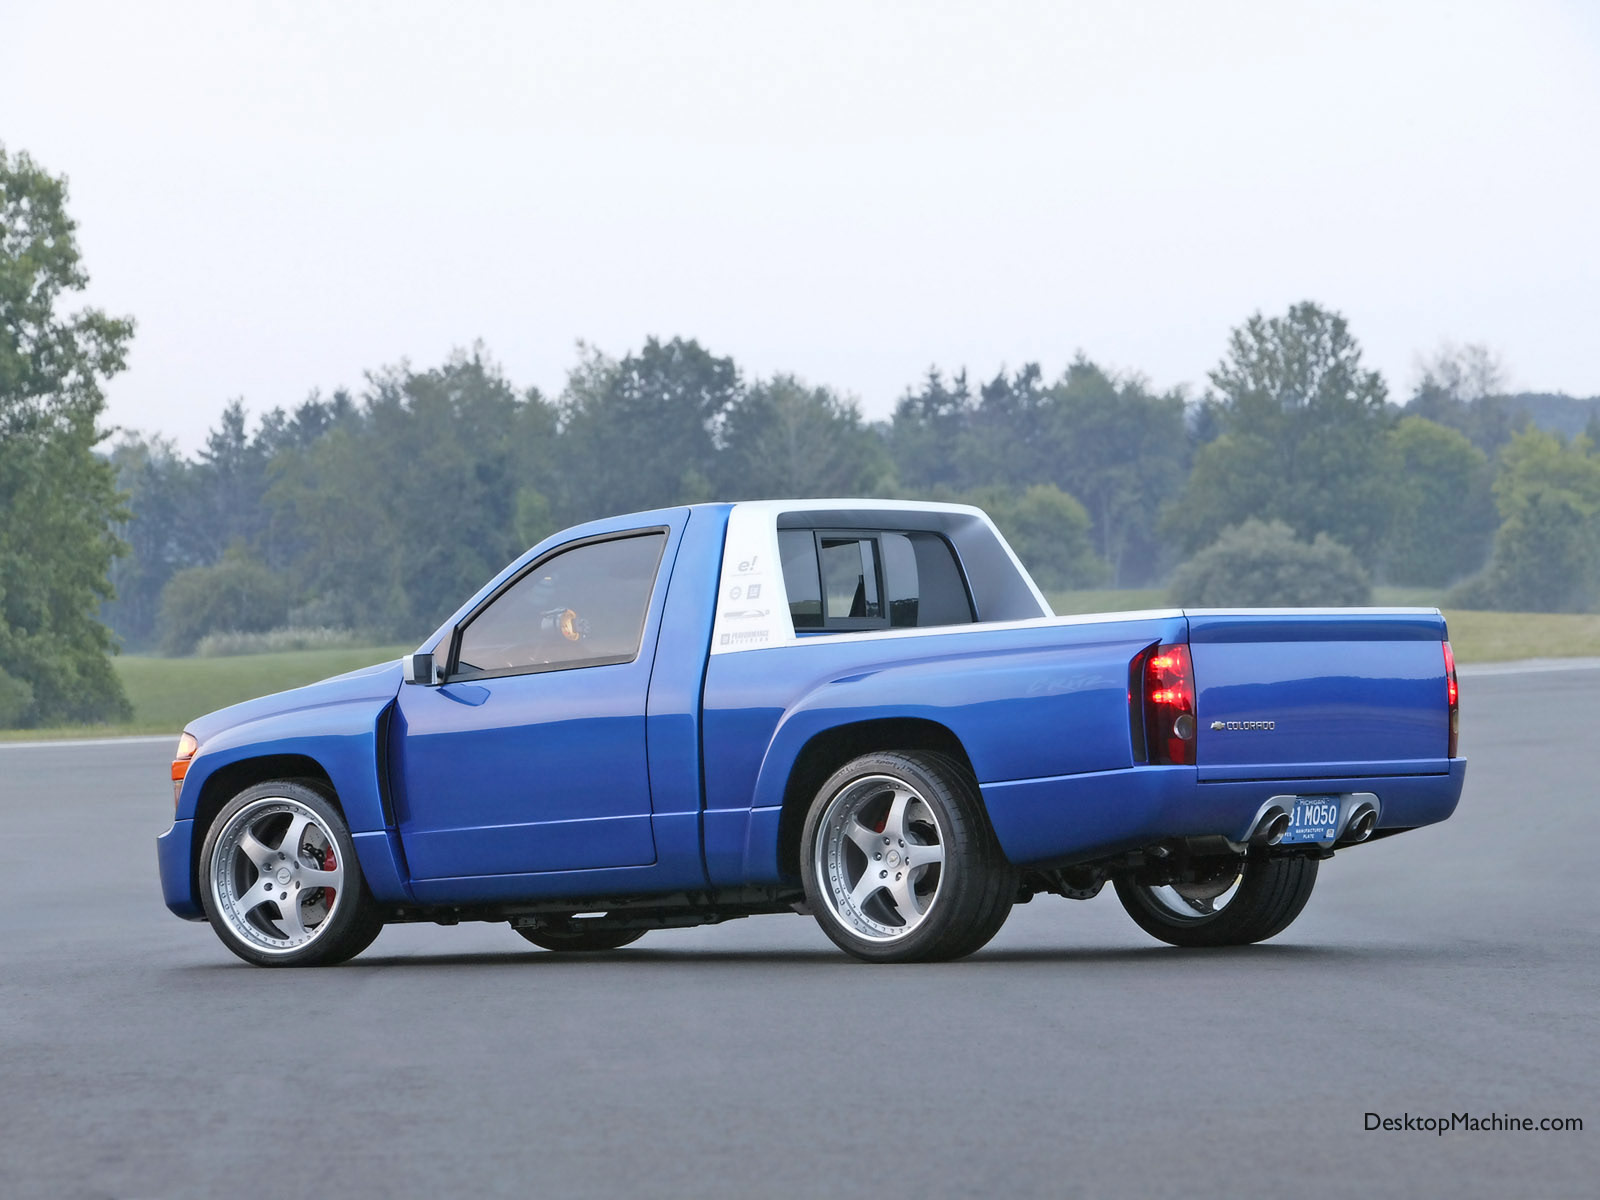 Chevrolet 34 Coupe E85 photos - PhotoGallery with 9 pics | CarsBase com